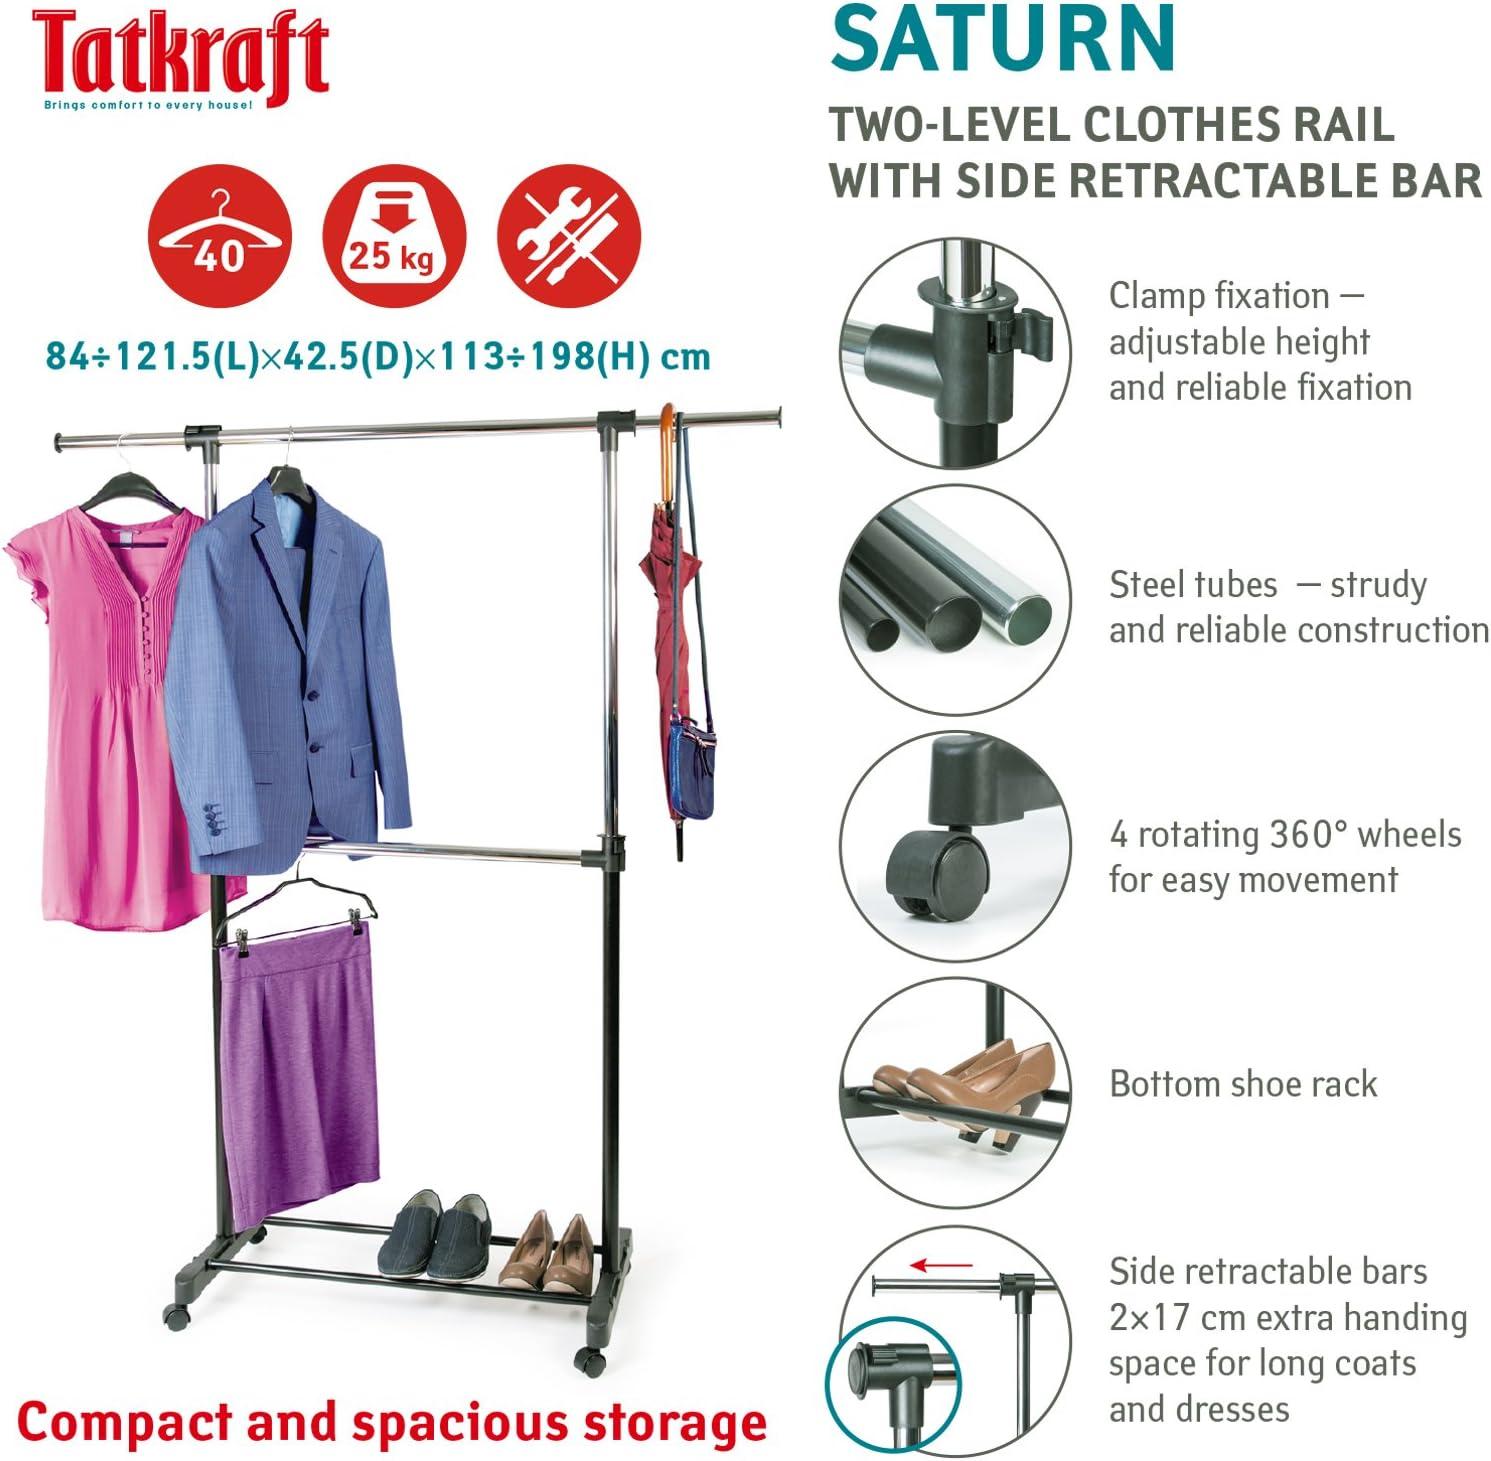 Tatkraft Saturn Perchero de Ropa con Ruedas 84-121.5X42.5X113-198 cm Acero Cromado